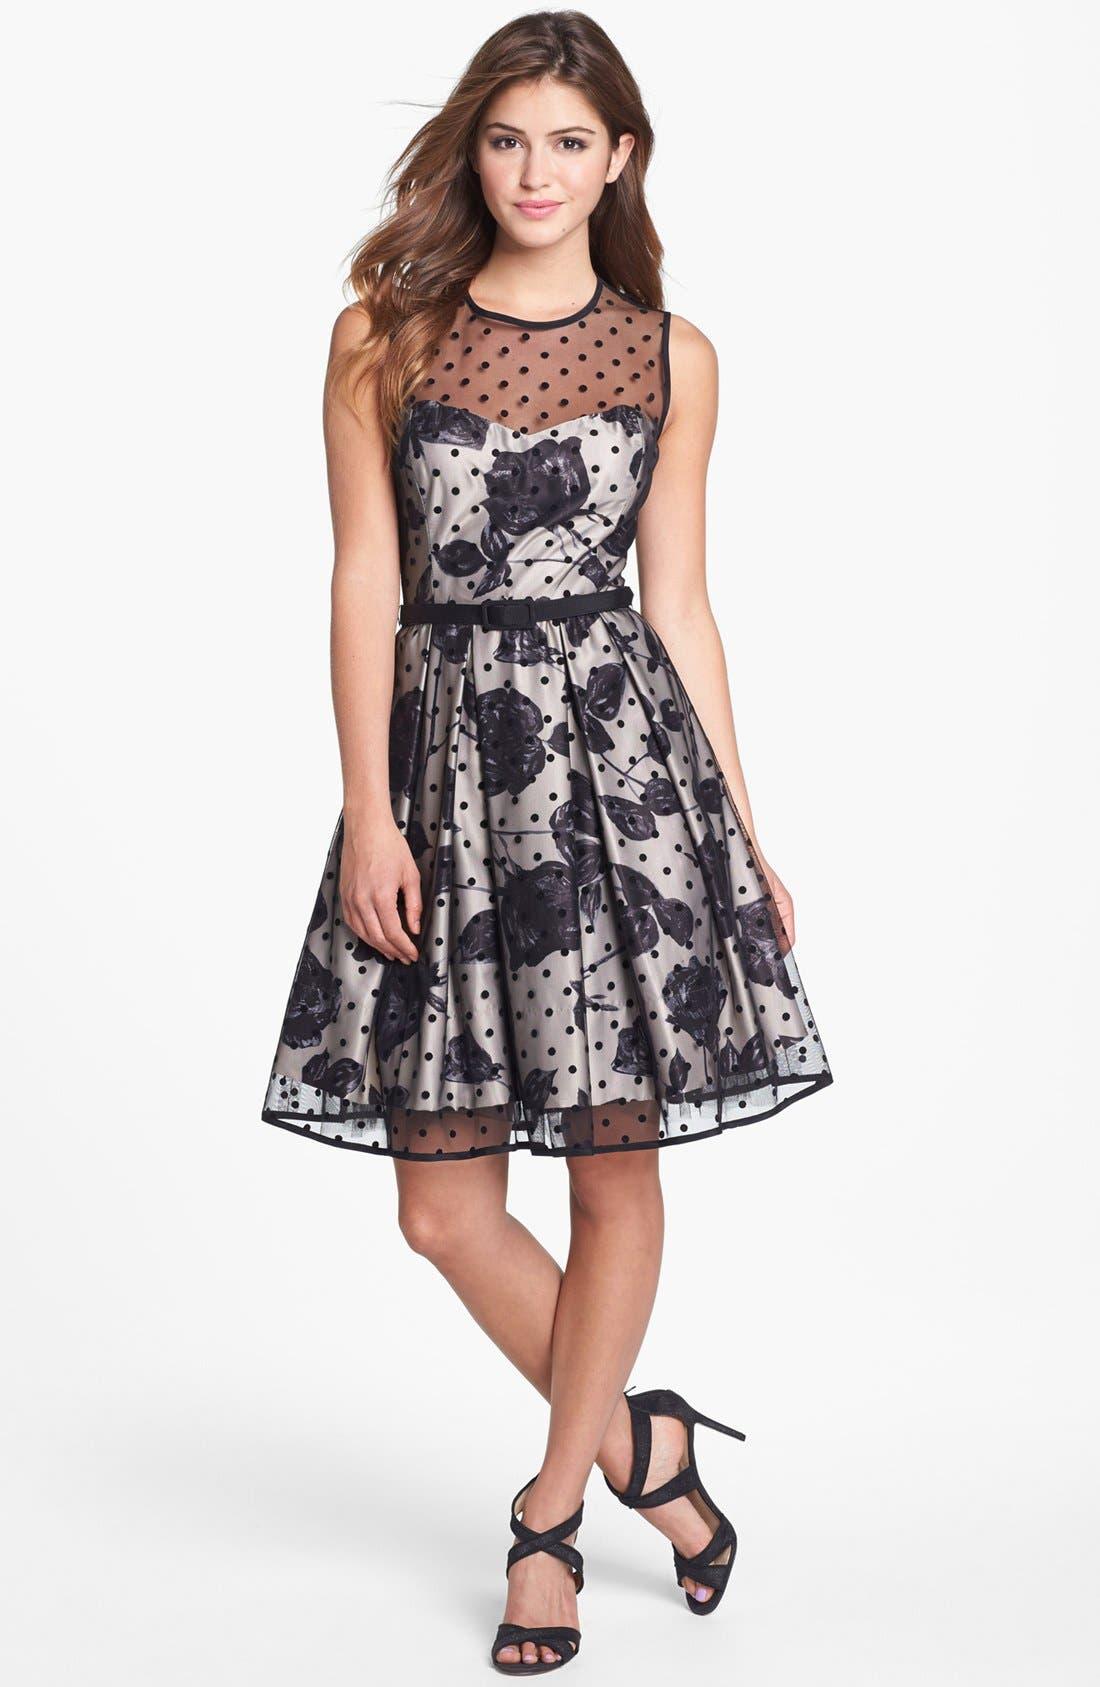 Alternate Image 1 Selected - Eliza J Illusion Dot Print Fit & Flare Dress